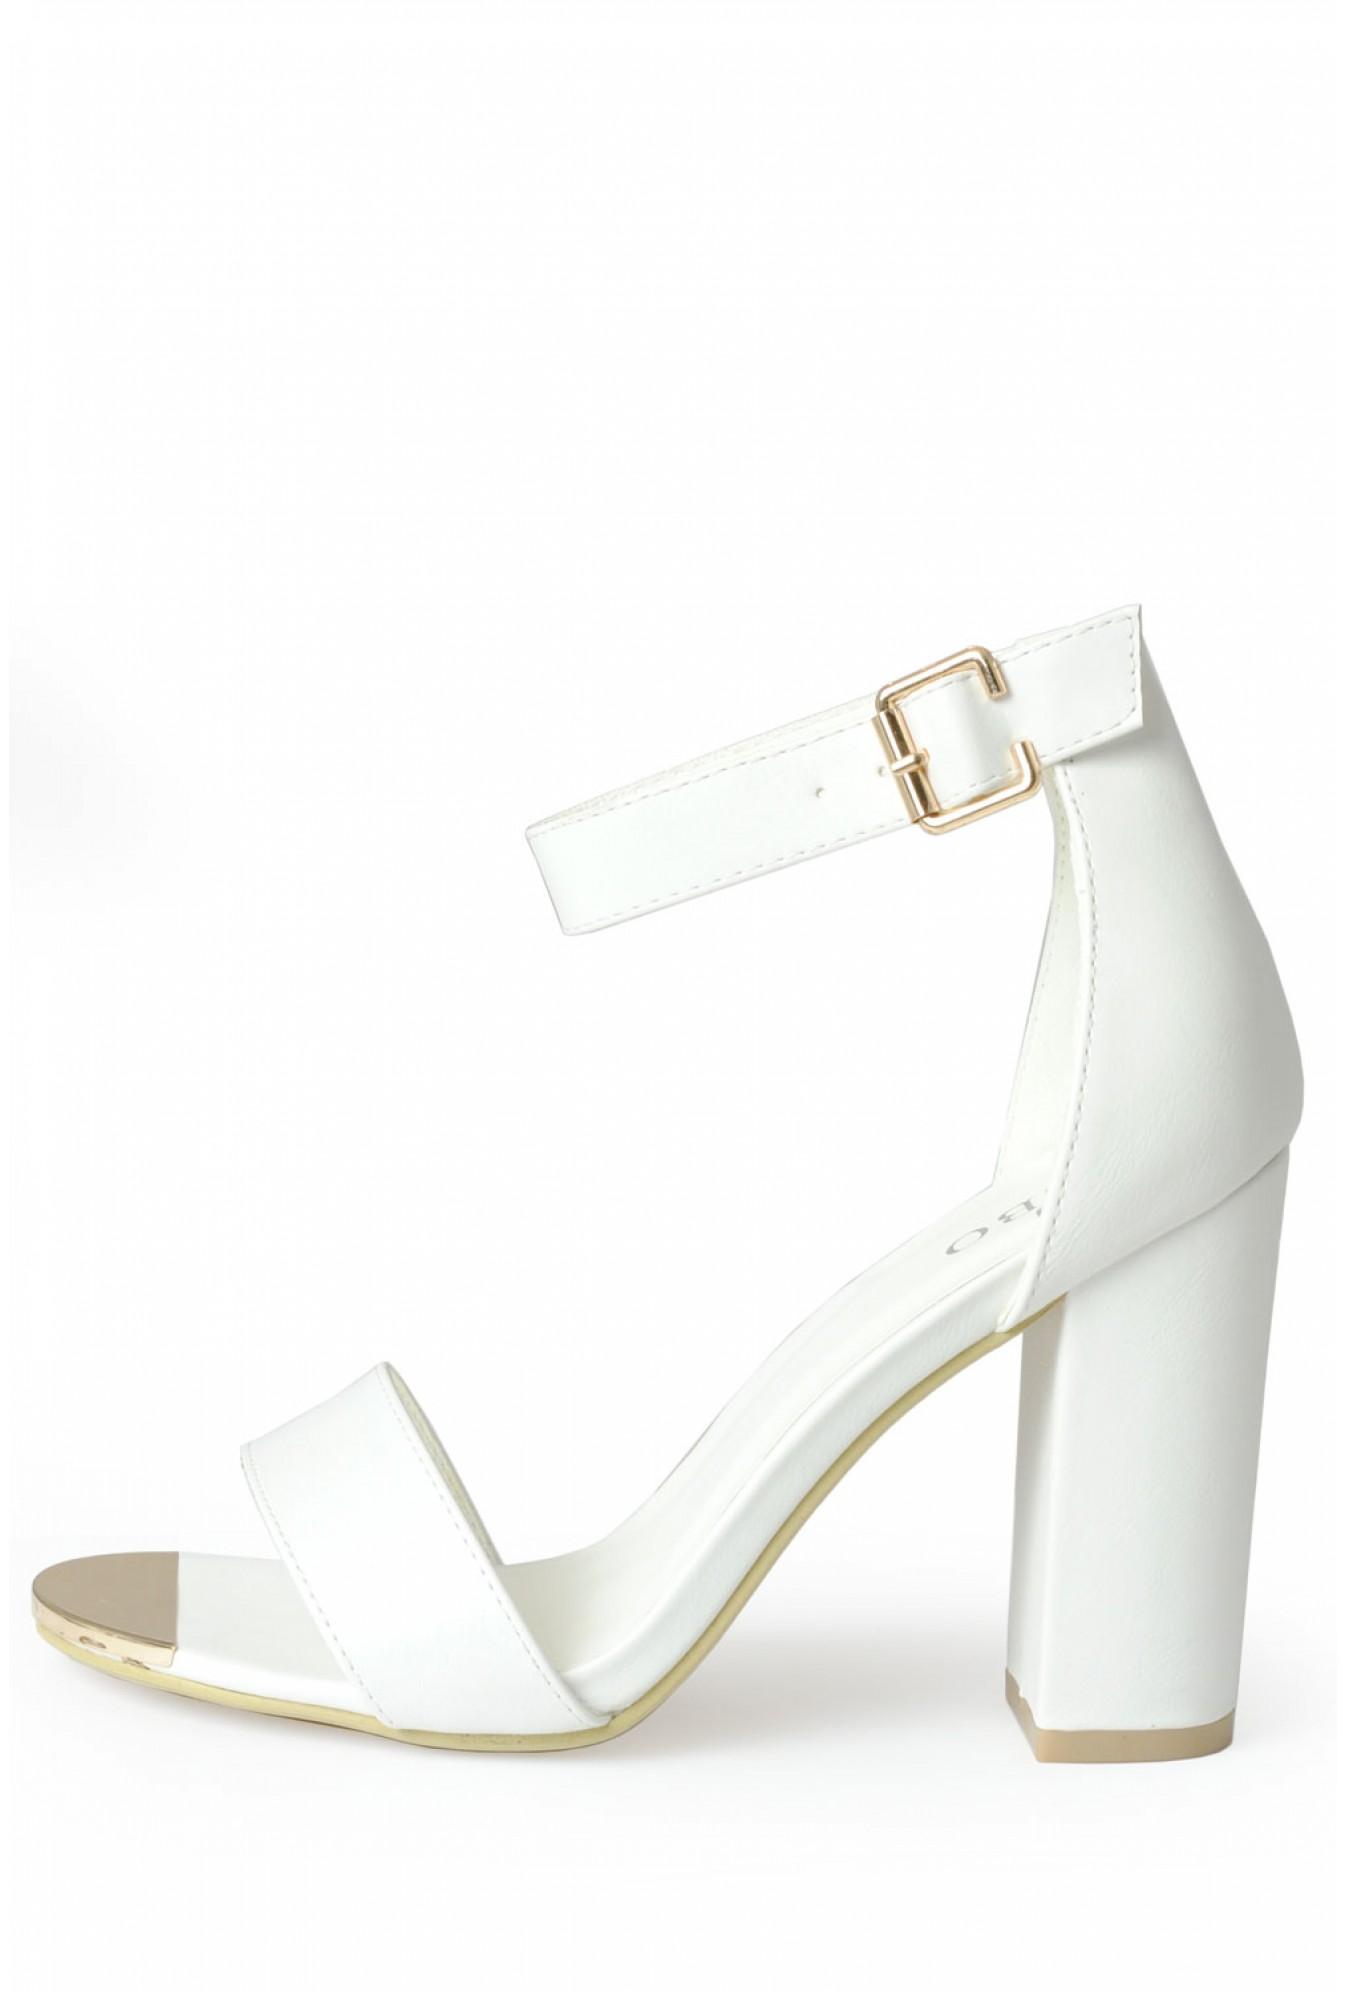 95da2f7e78a Indigo Footwear Aliya Strappy Block Heel Sandals in White